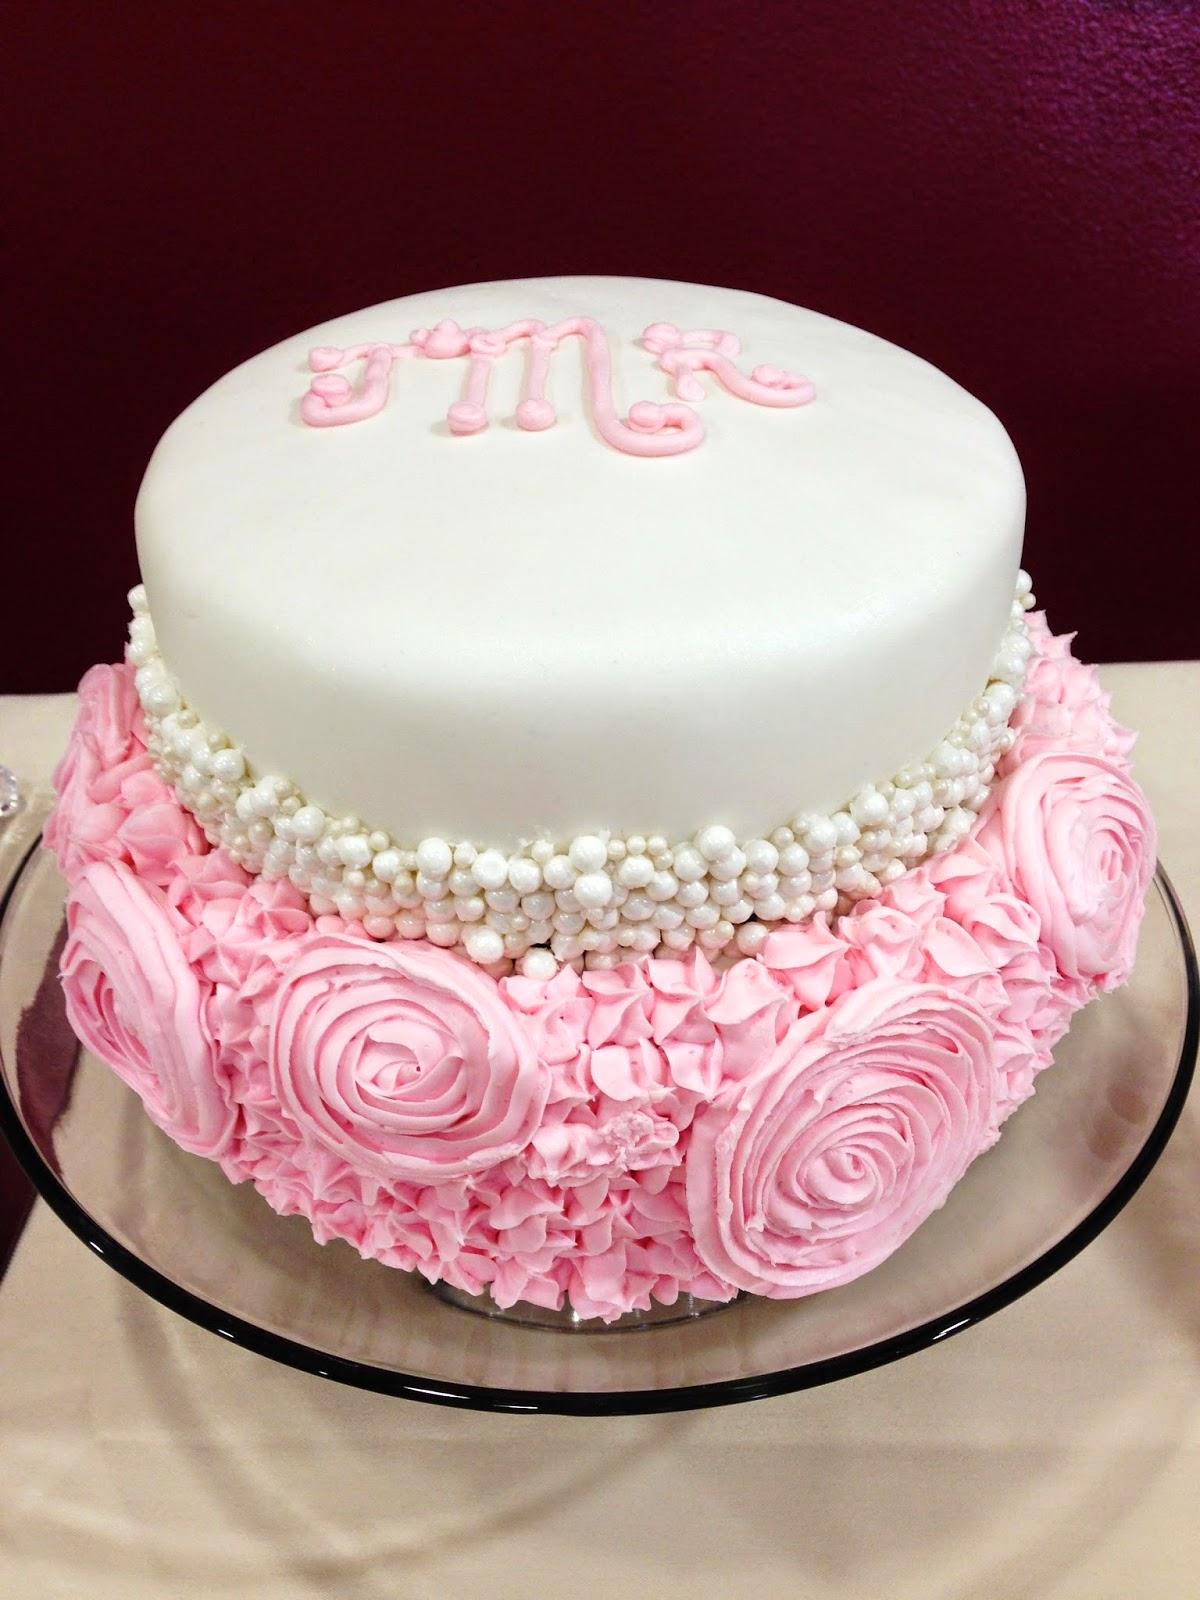 85th Birthday Cake Designs 85th Birthday Cake Cake By Beatrice Rose